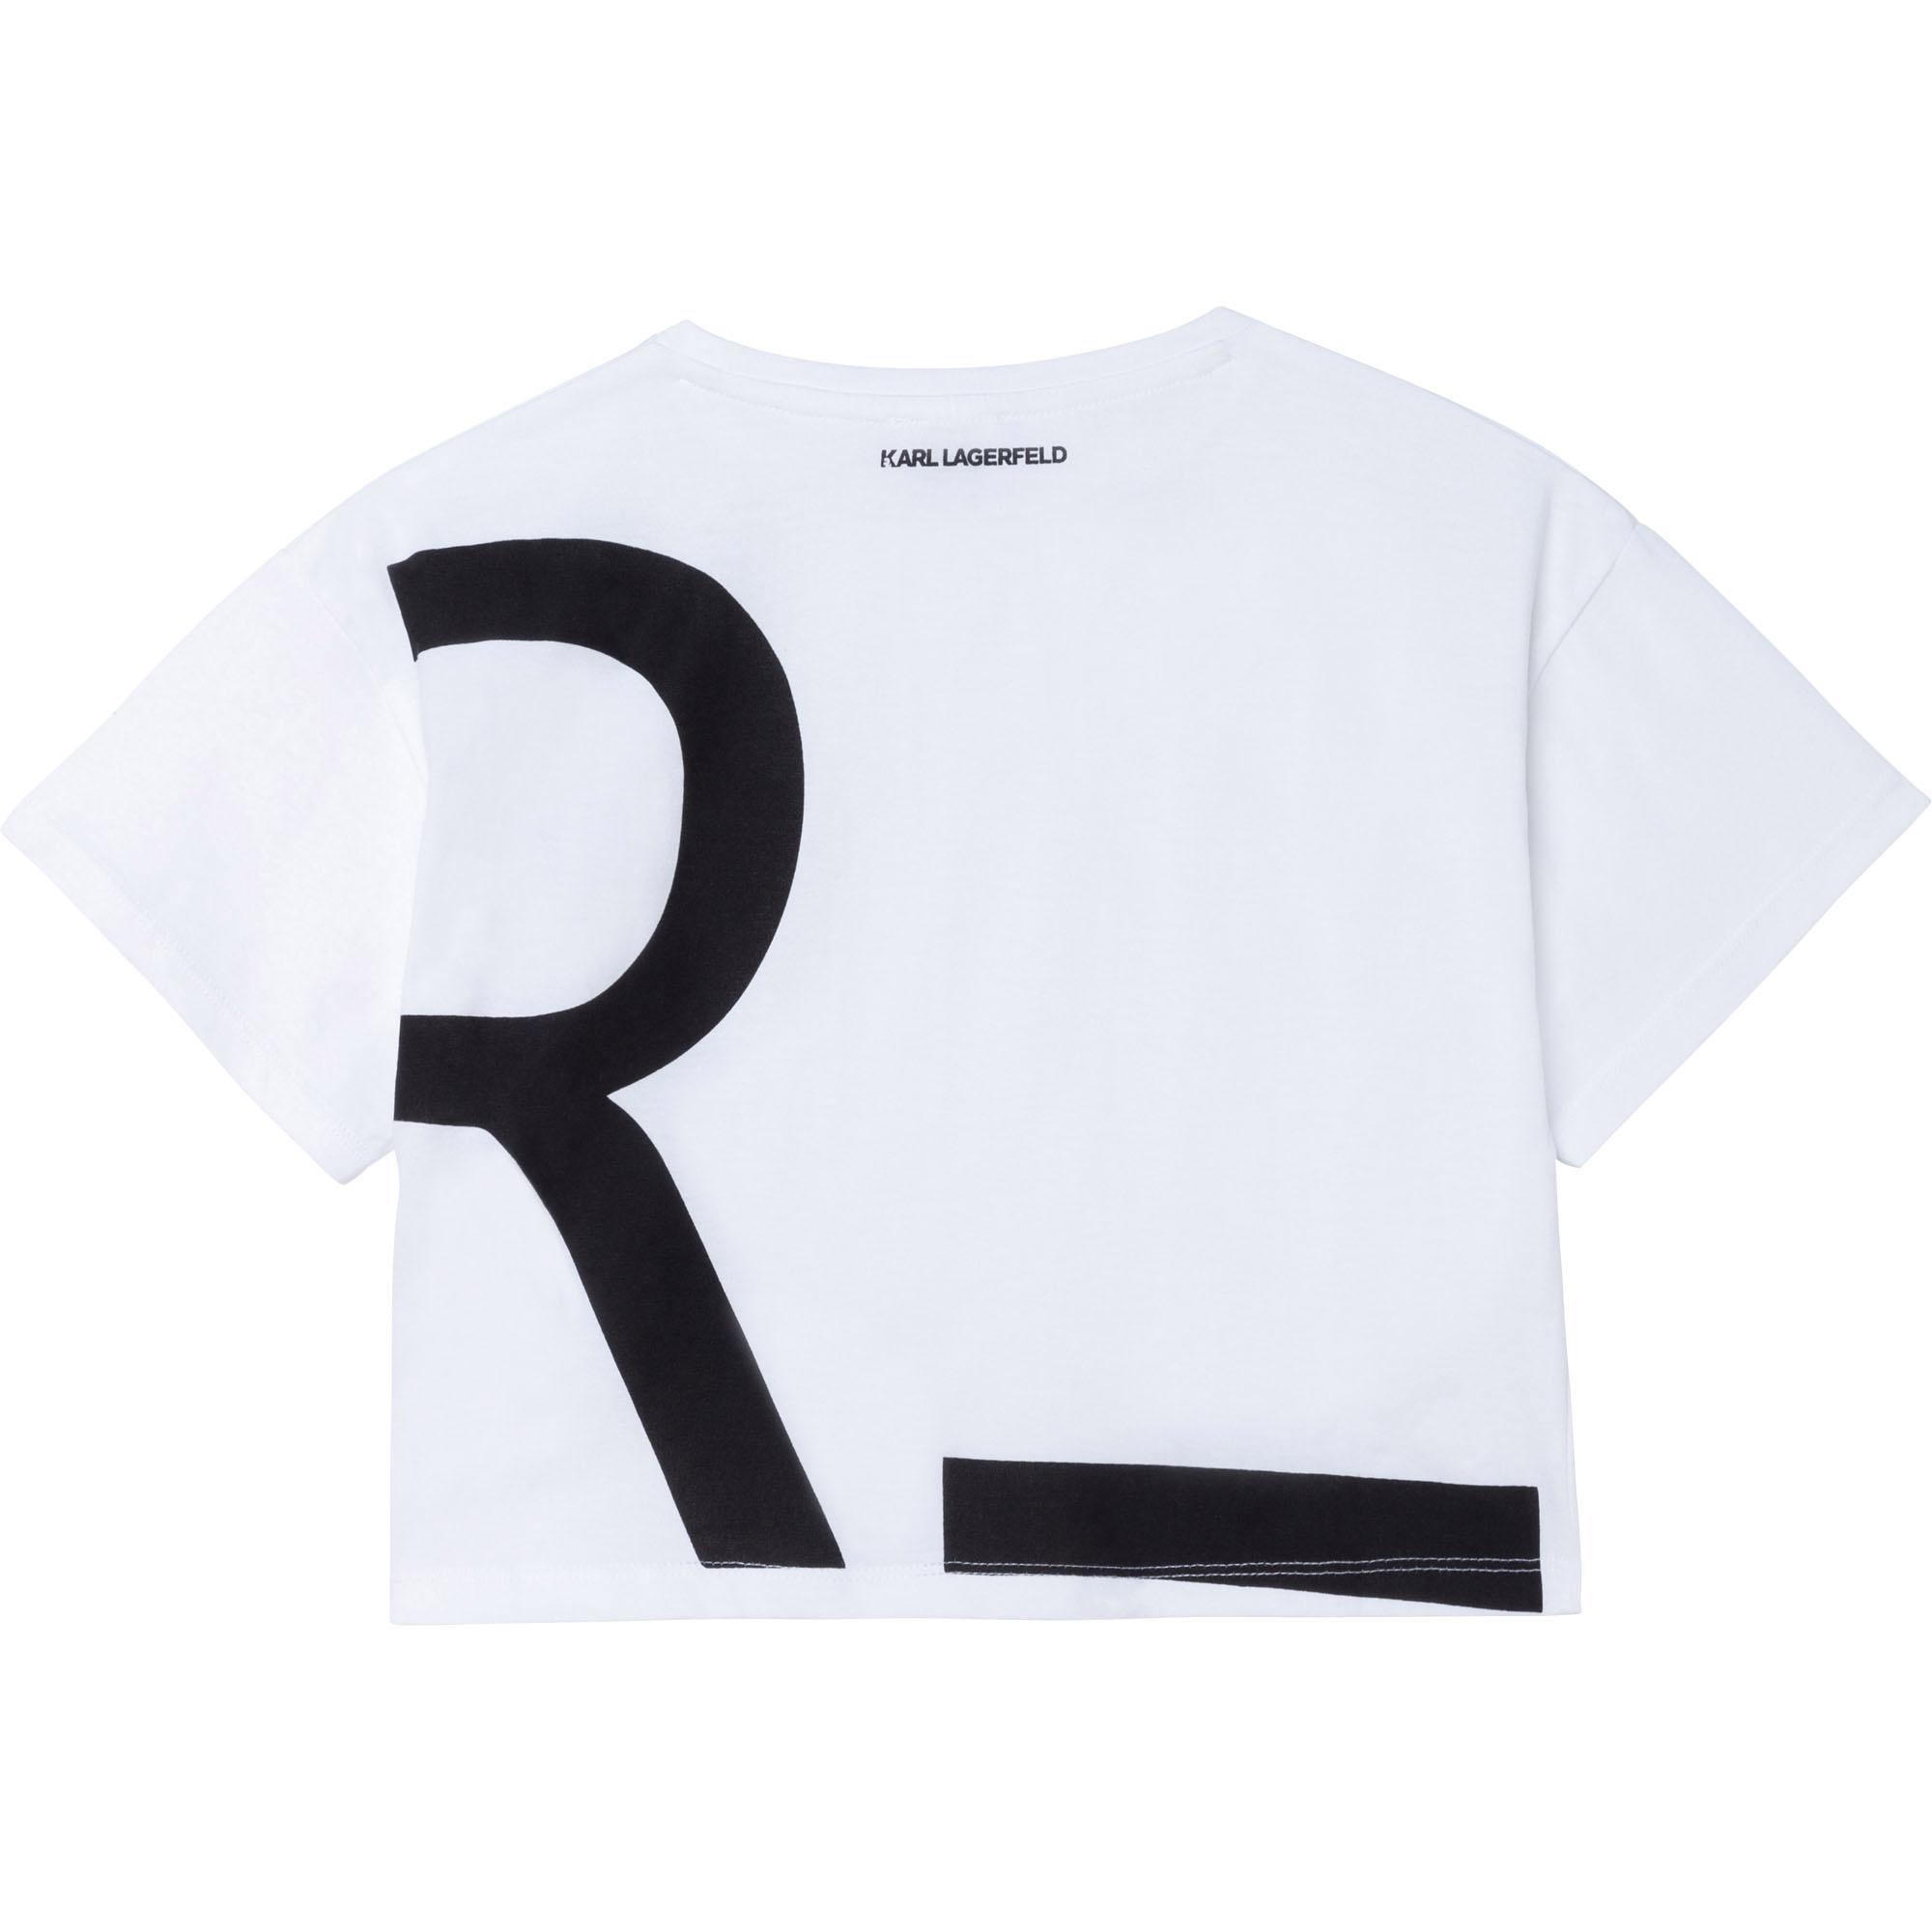 KARL LAGERFELD  KIDS  t-shirt modal-3